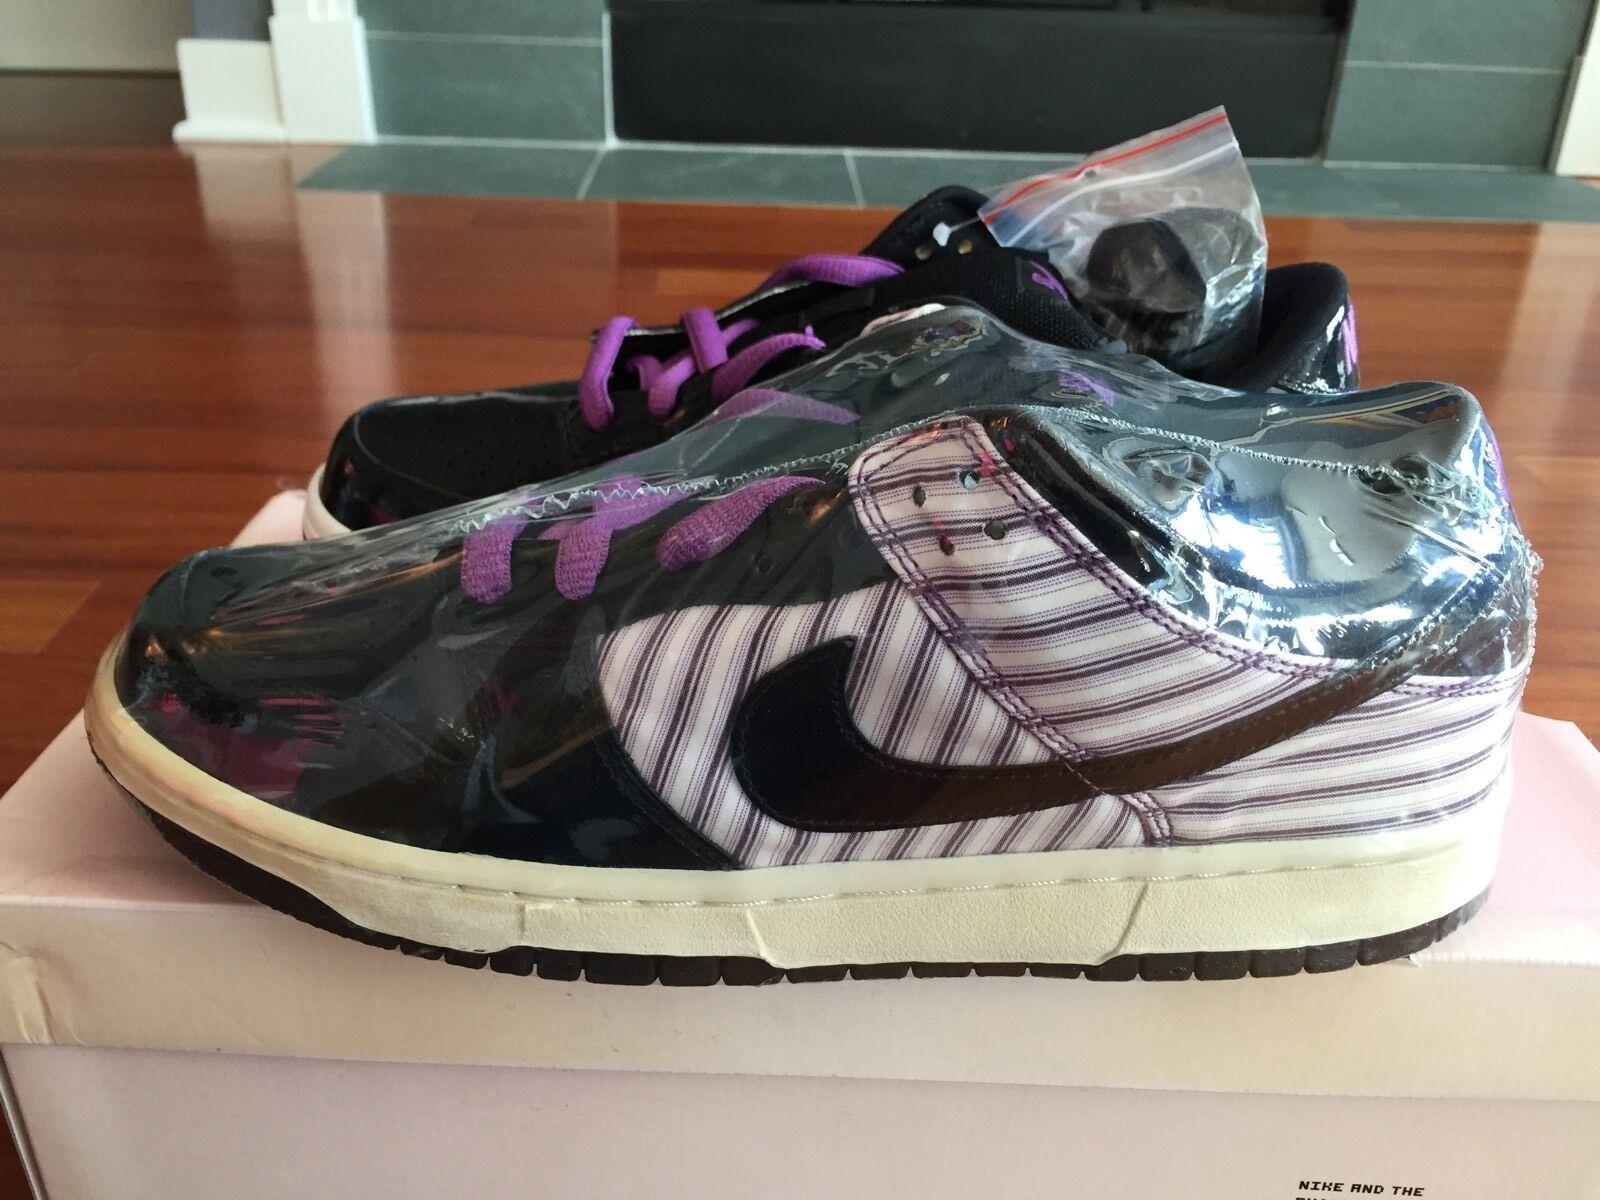 Nike SB Patent Avenger Dunk Purple Deadstock Size 11 (What the Dunk Jedi)